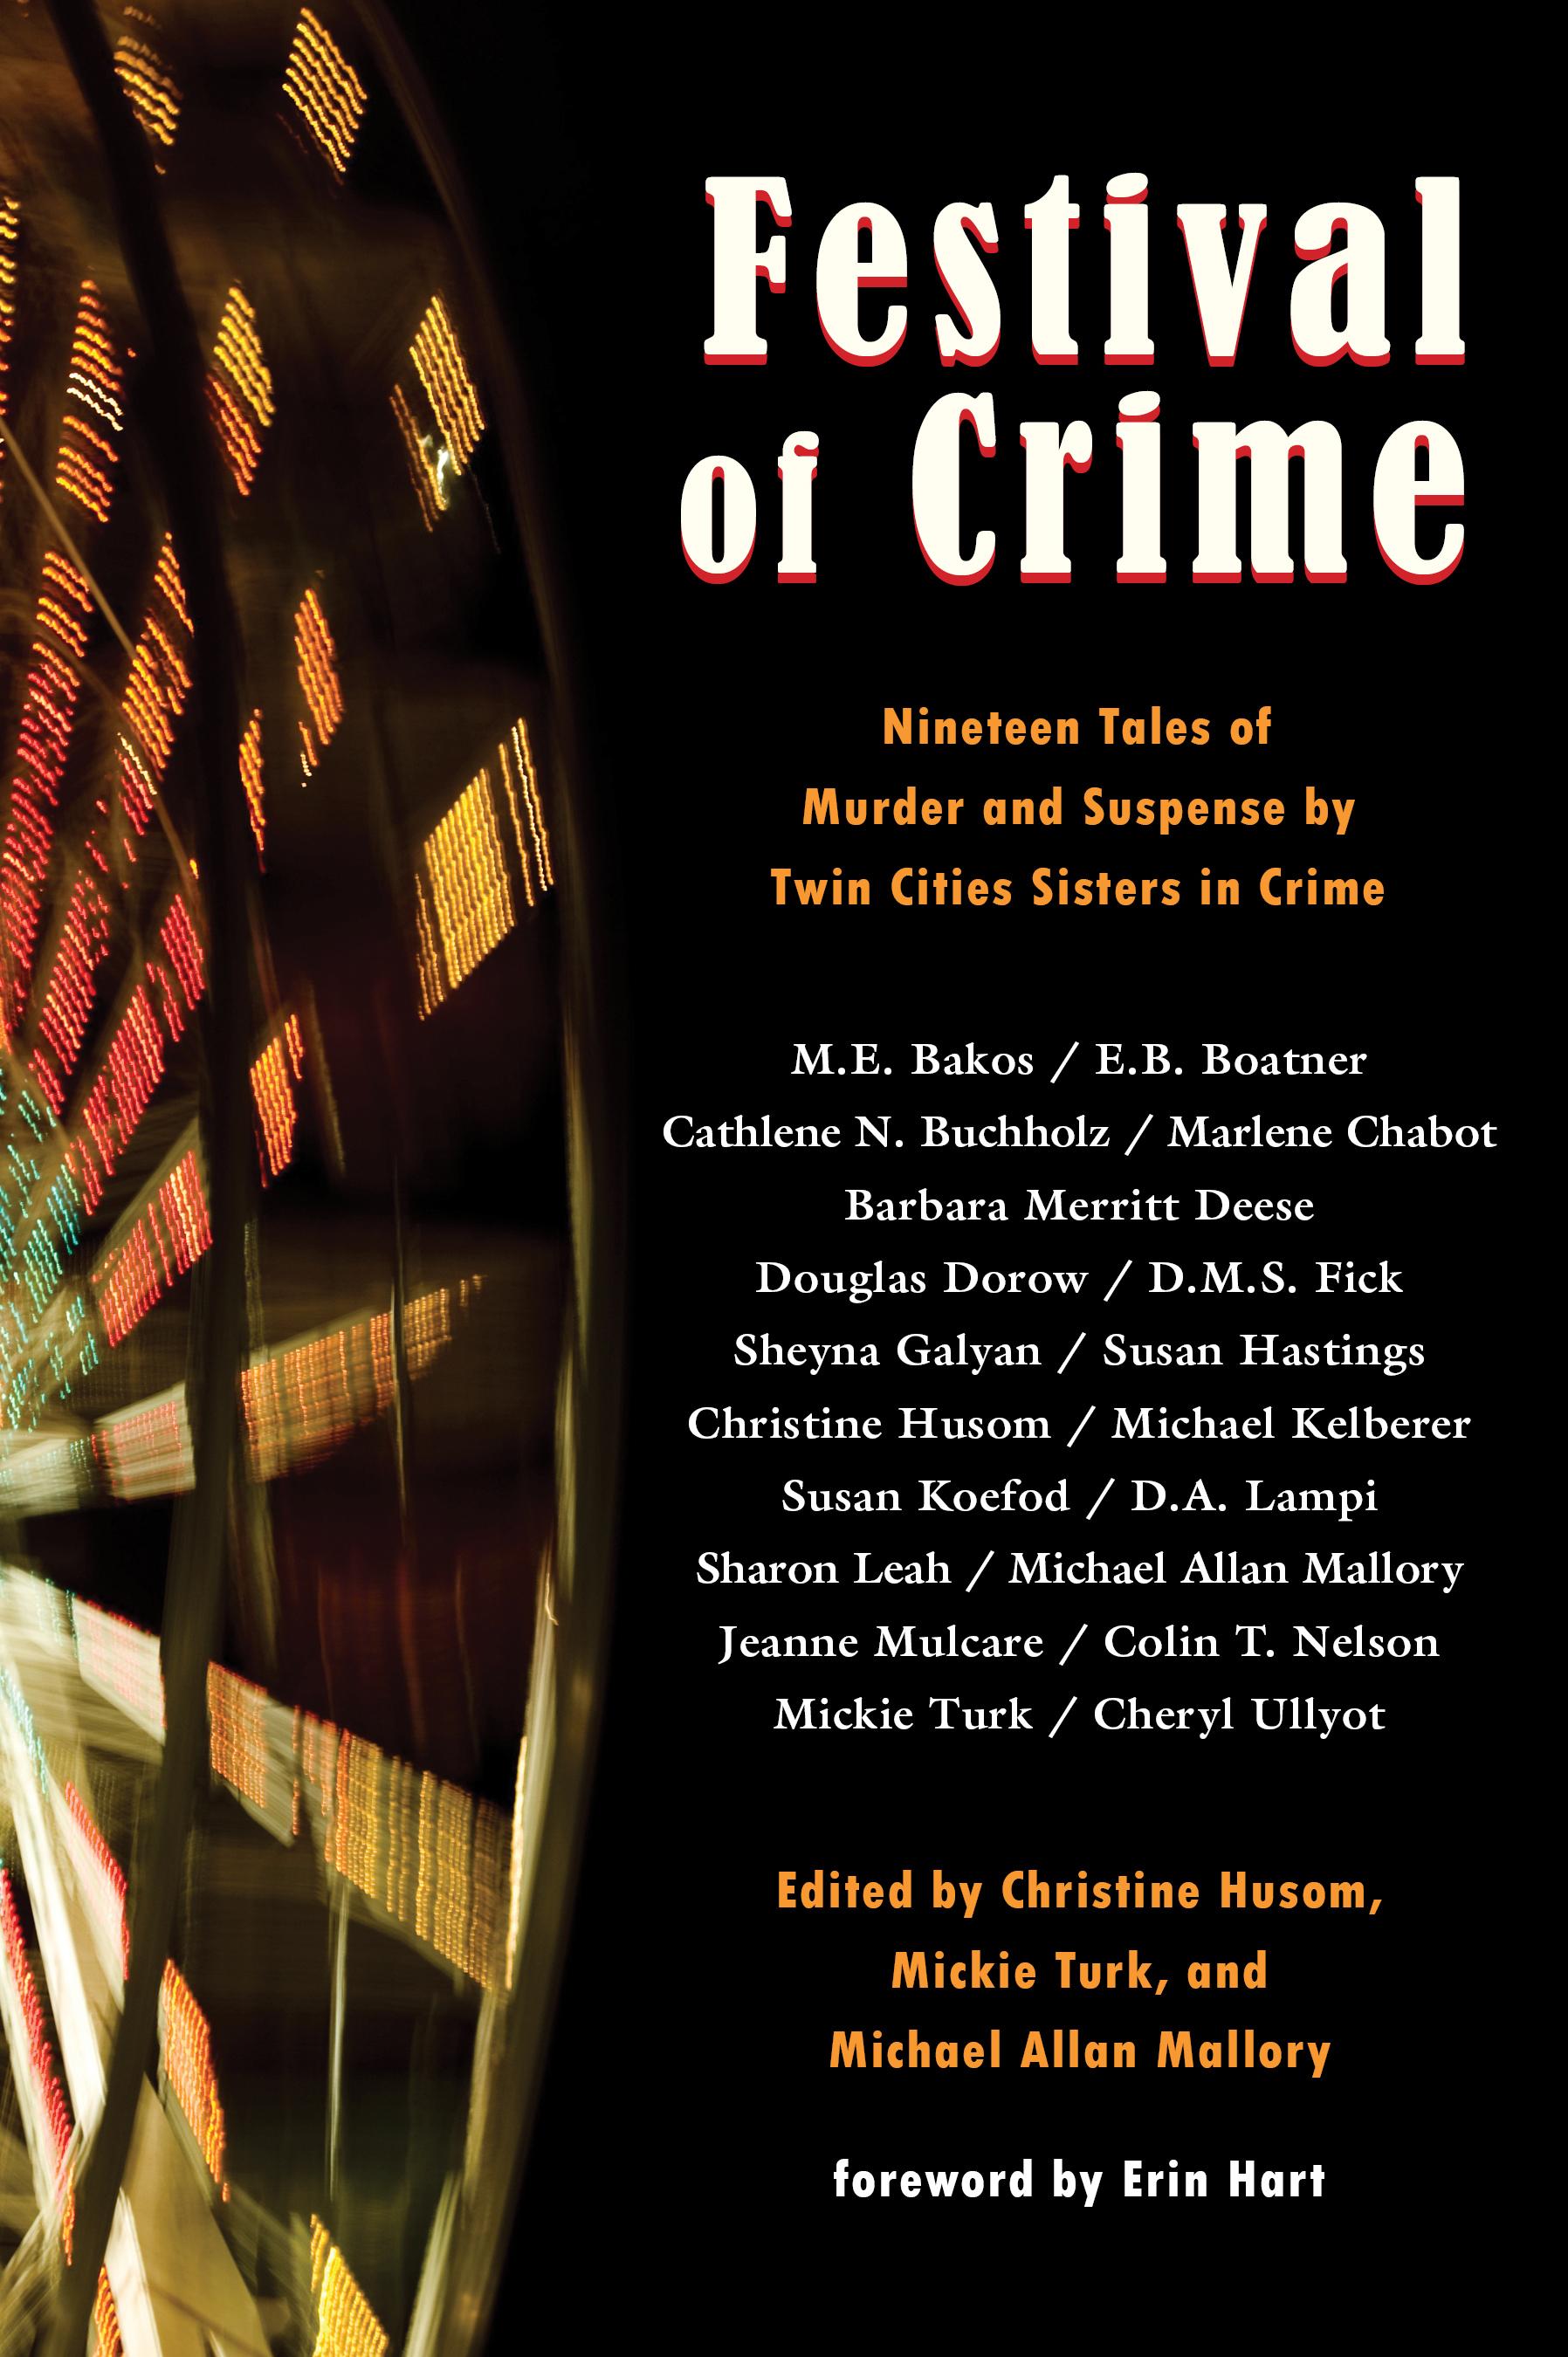 Festival_of_Crime_Cover